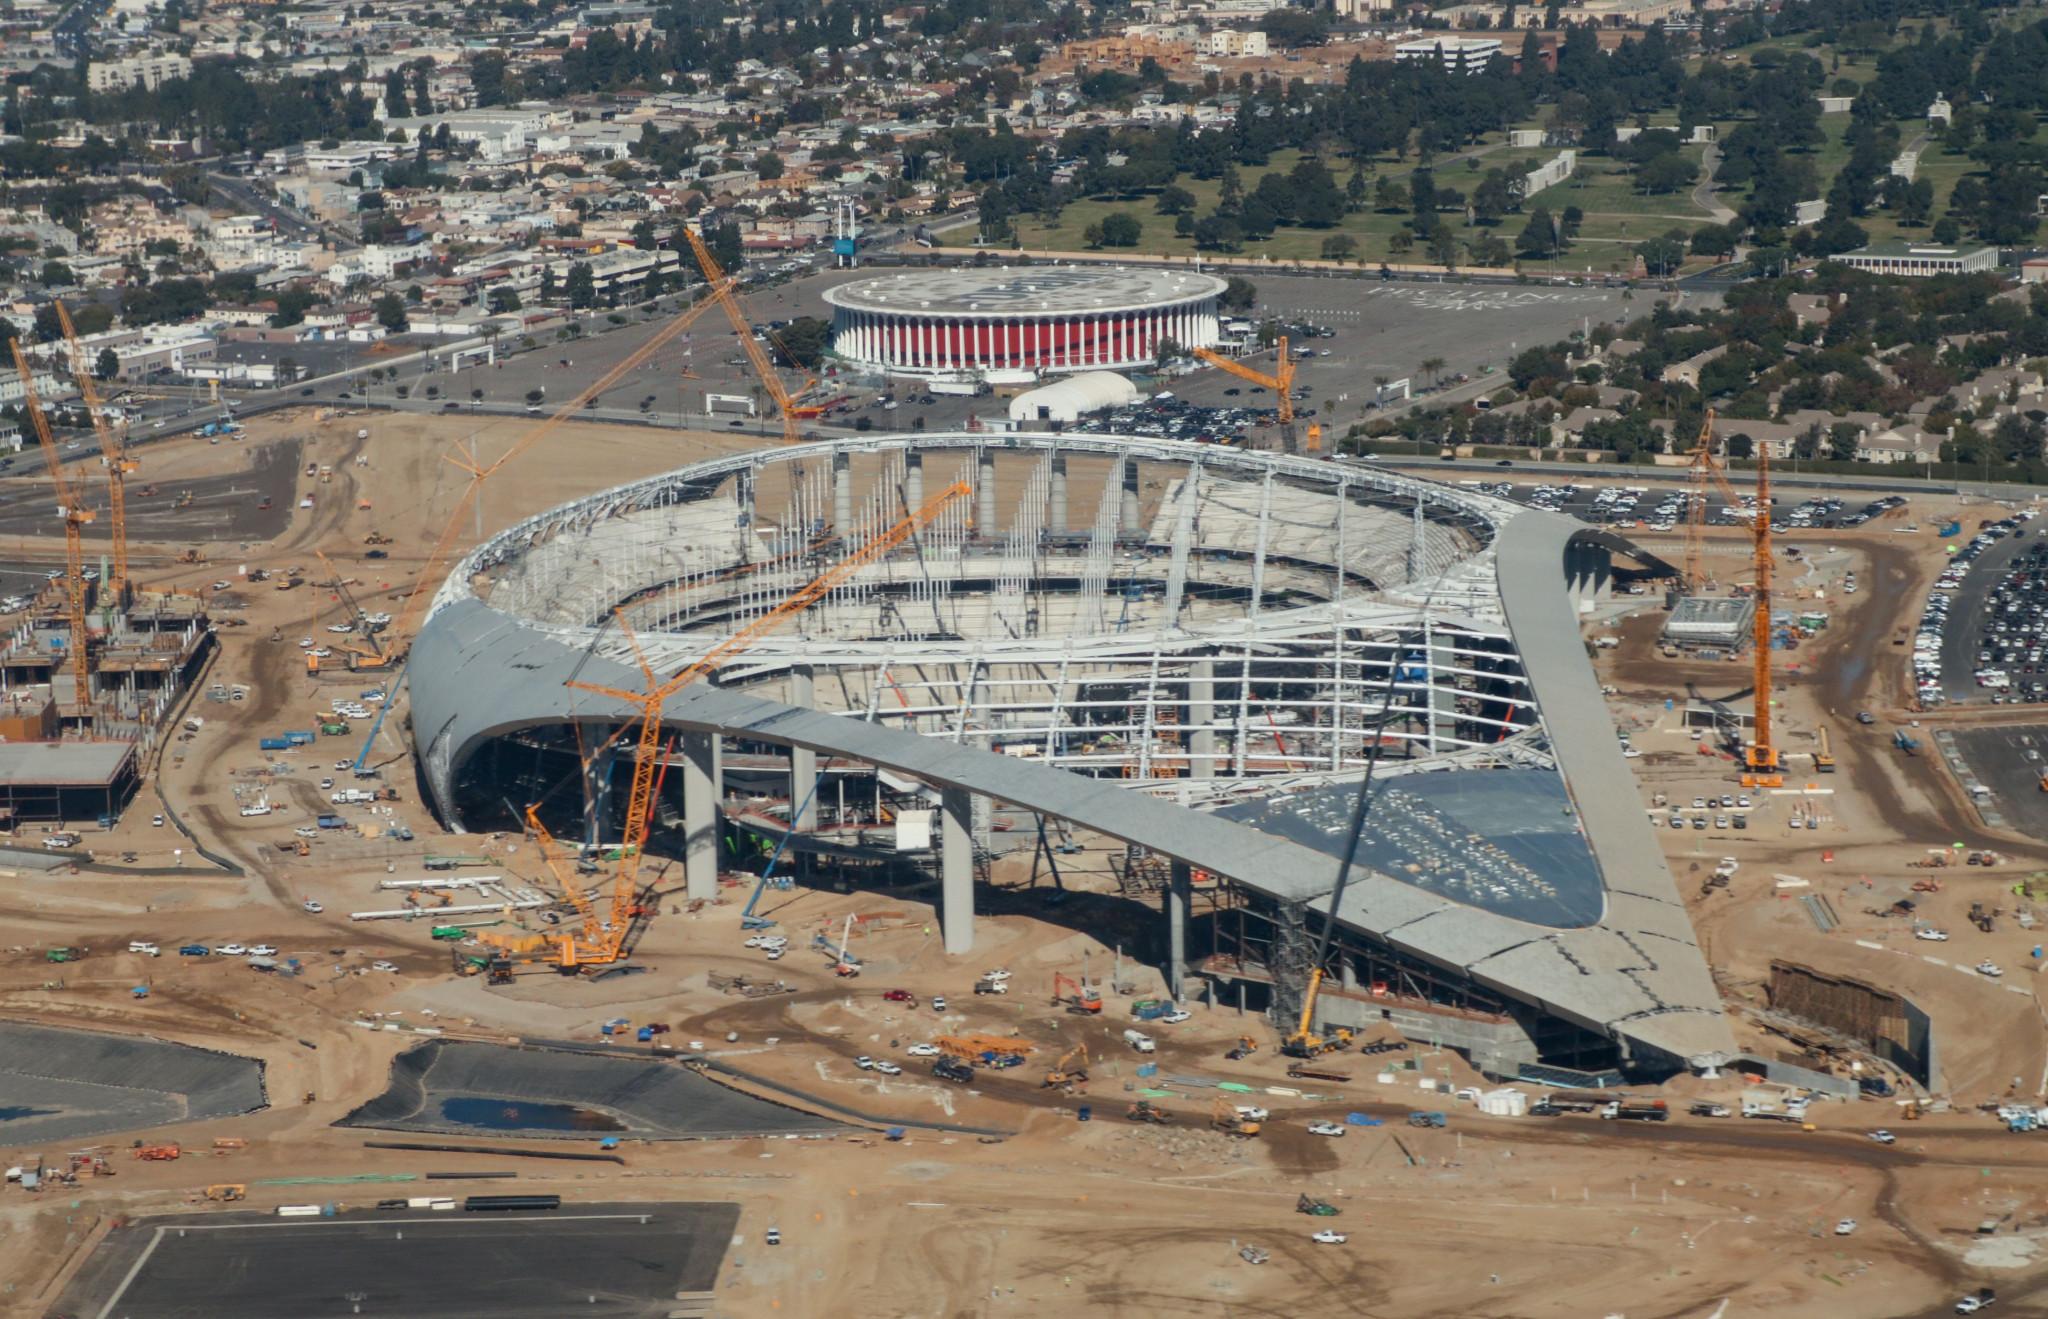 SoFi Stadium construction continues despite worker's positive coronavirus test